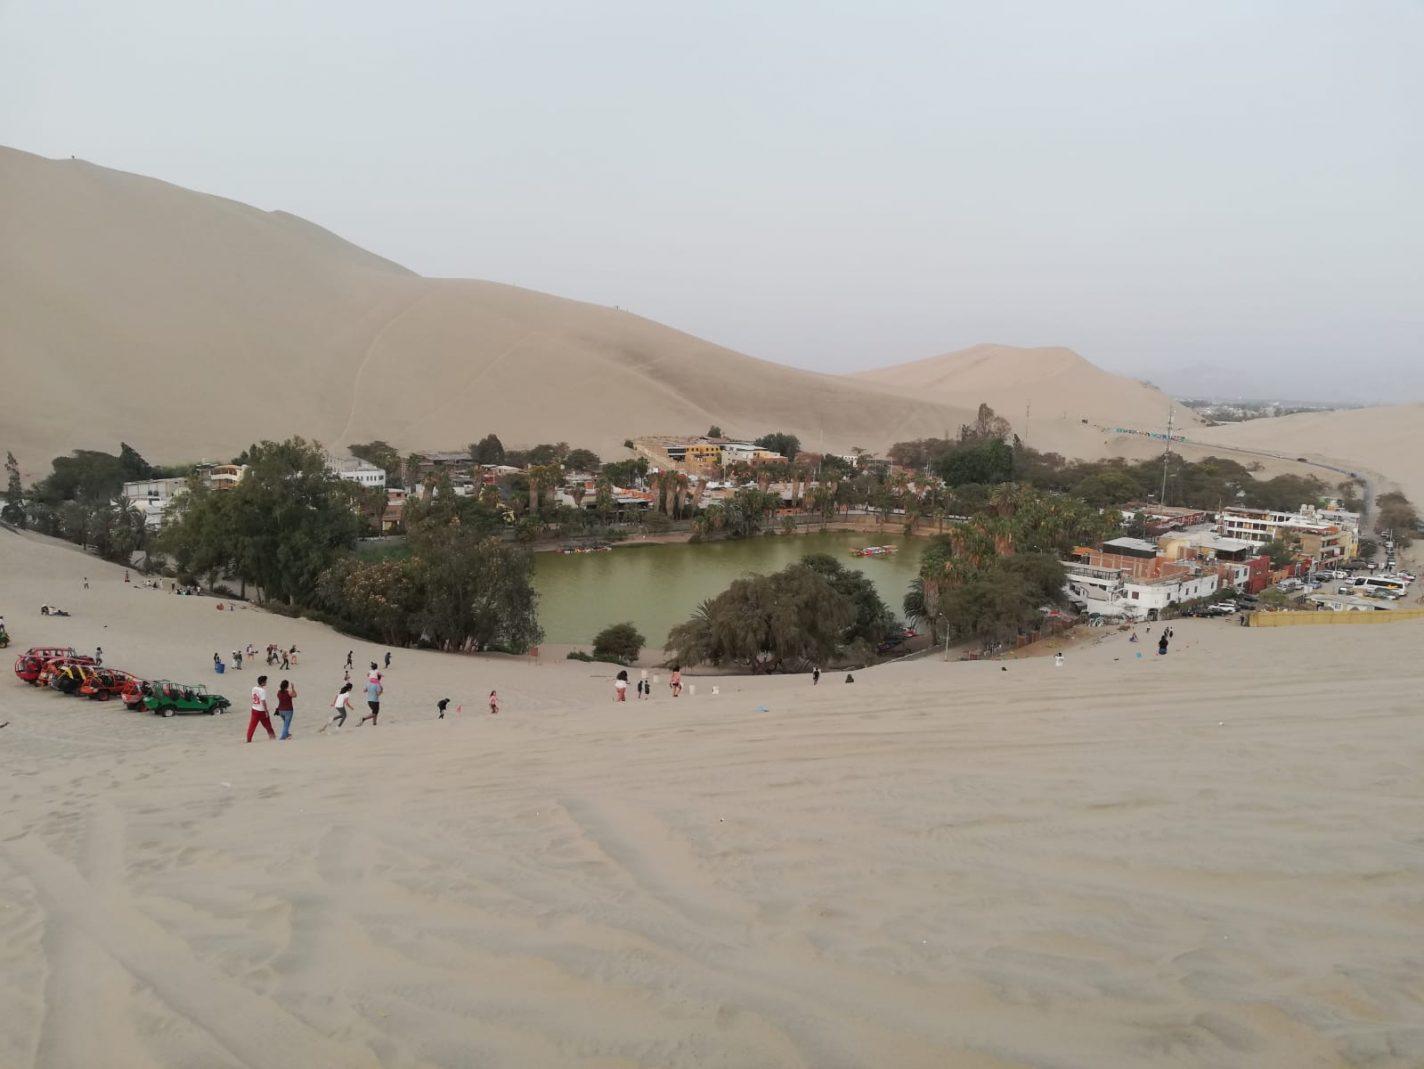 De oase van Huacachina - reisblog over Peru